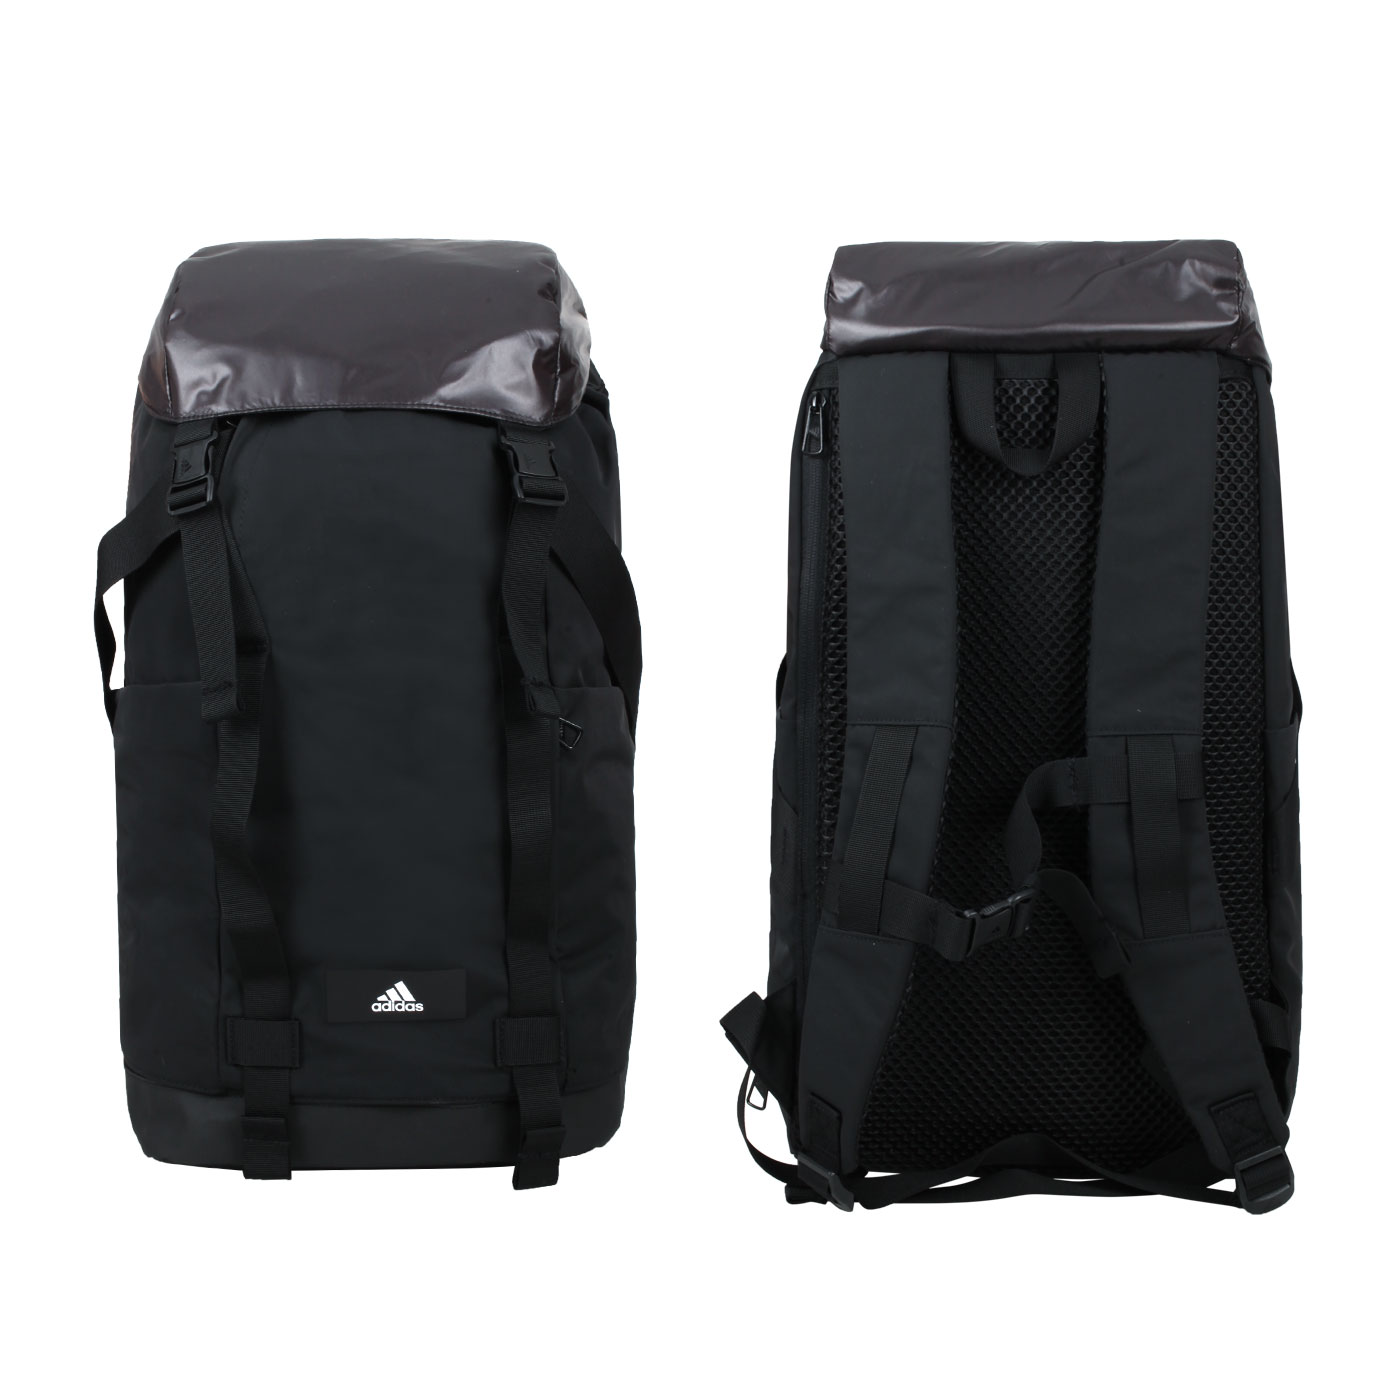 ADIDAS 後背包 GM4538 - 黑白